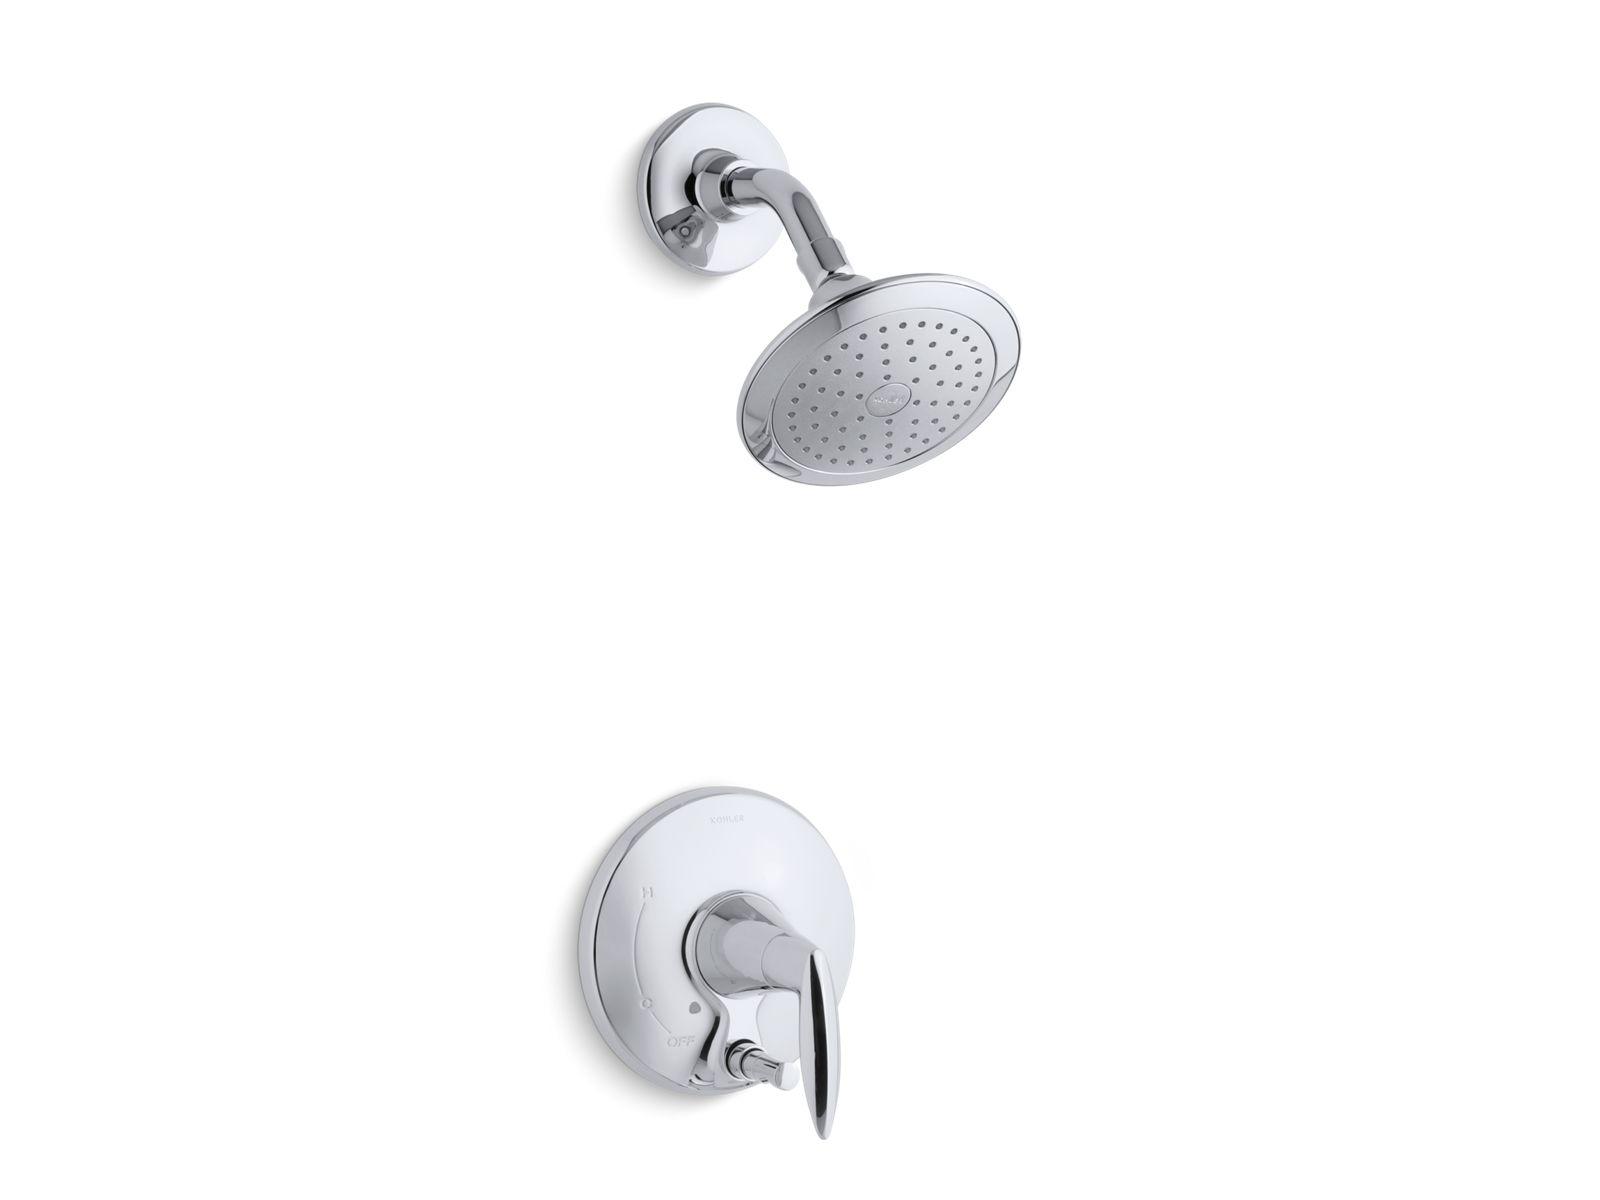 alteo shower trim with pushbutton diverter valve not included kt451084e kohler